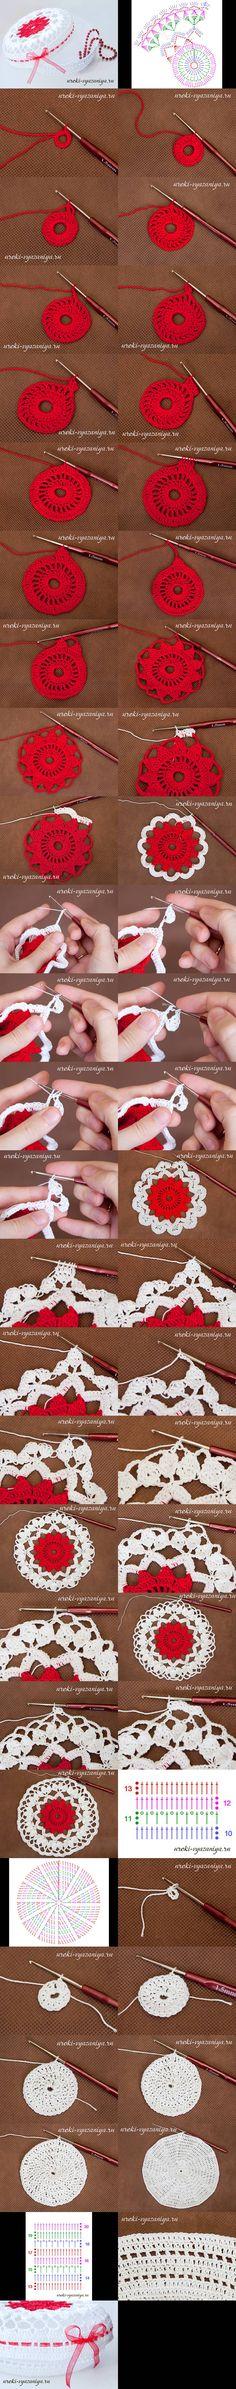 http://www.usefuldiy.com/diy-crochet-jewelry-bowl/